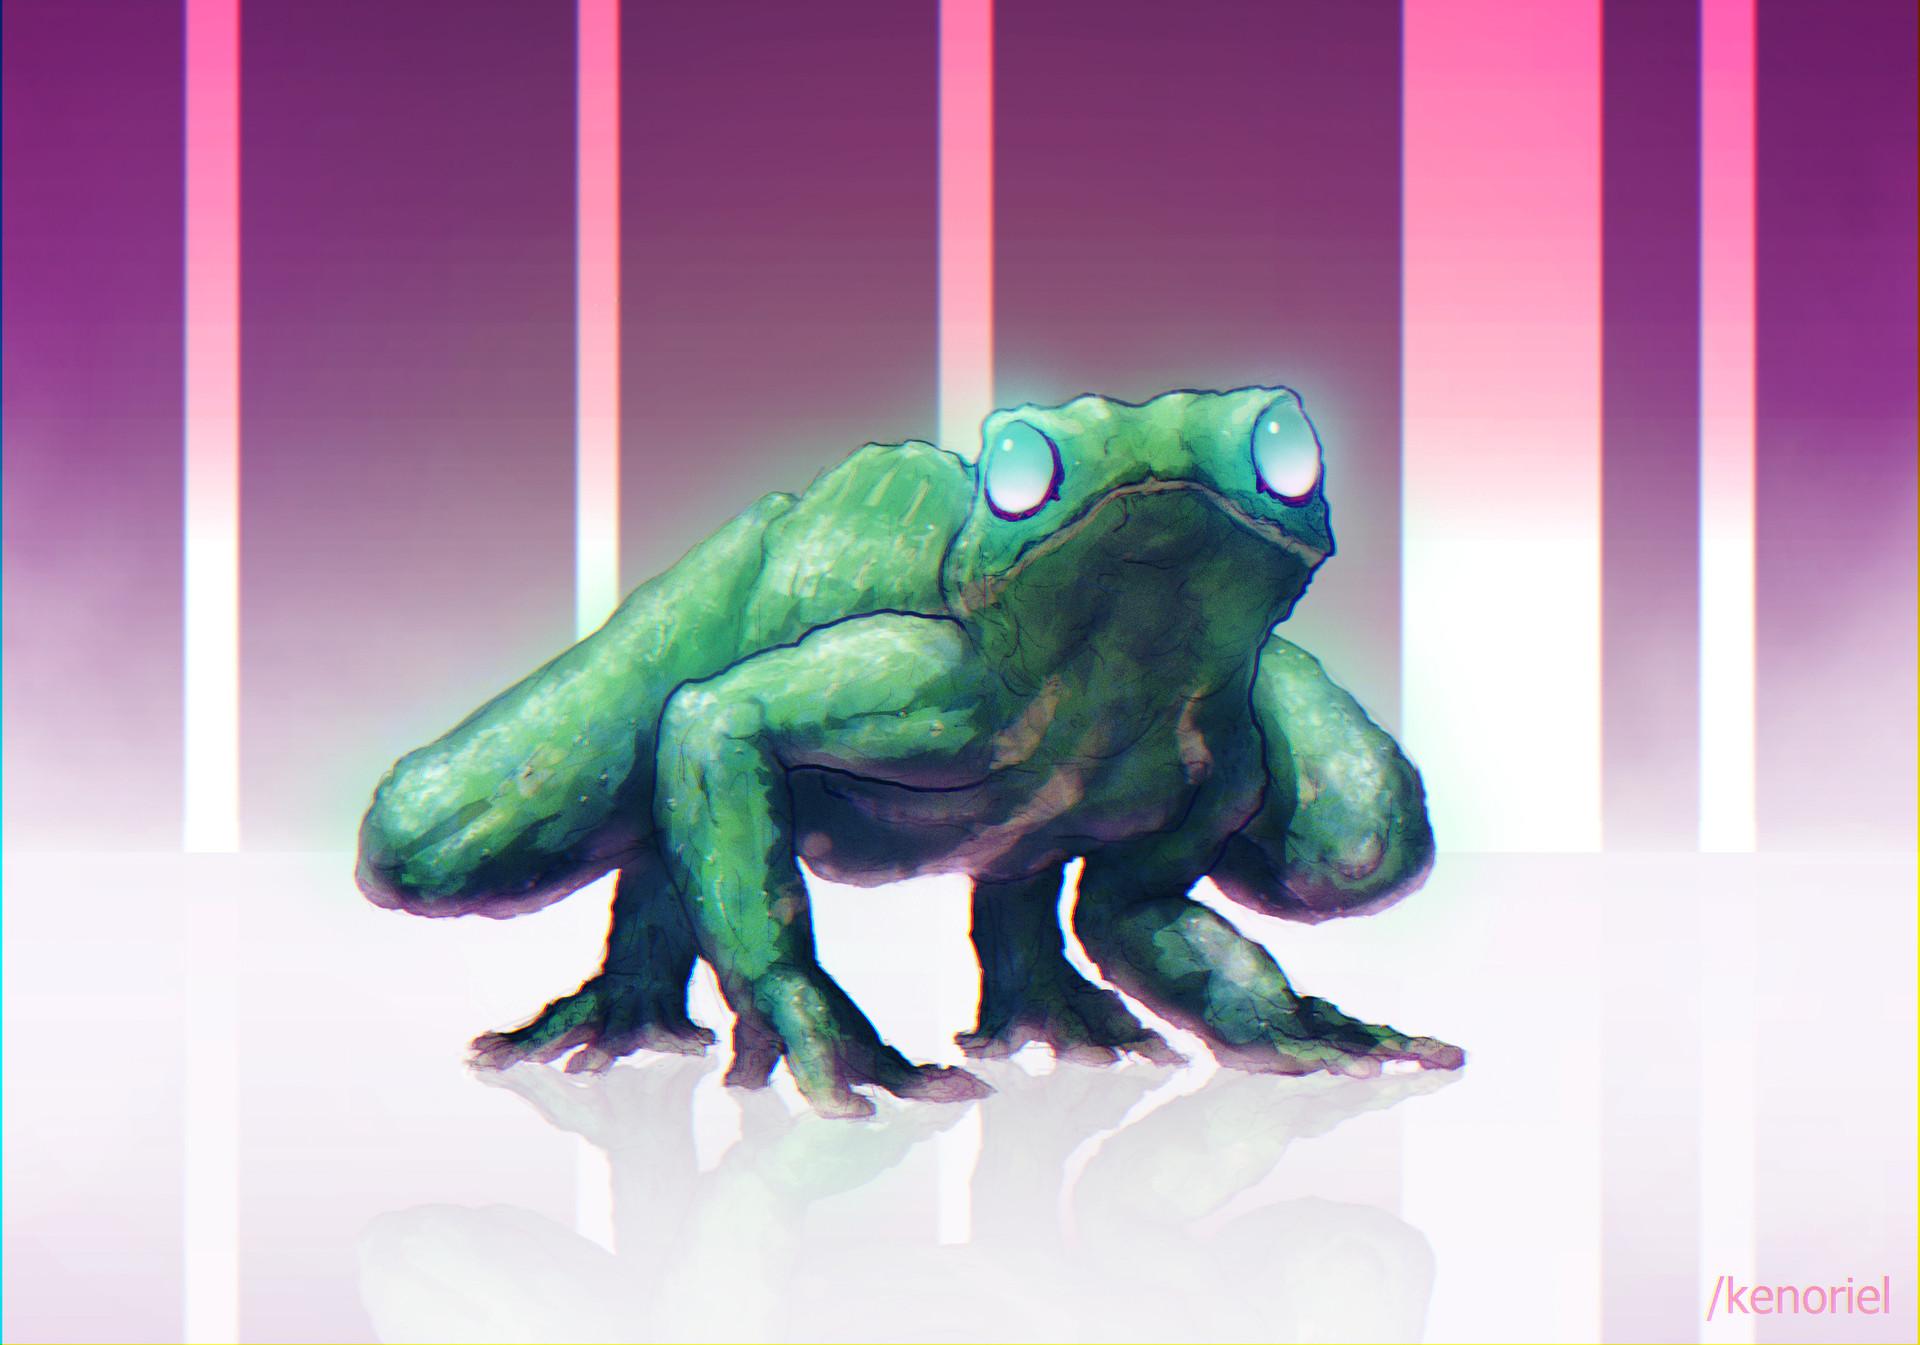 Freelance 2d illustrator/concept artist looking for work